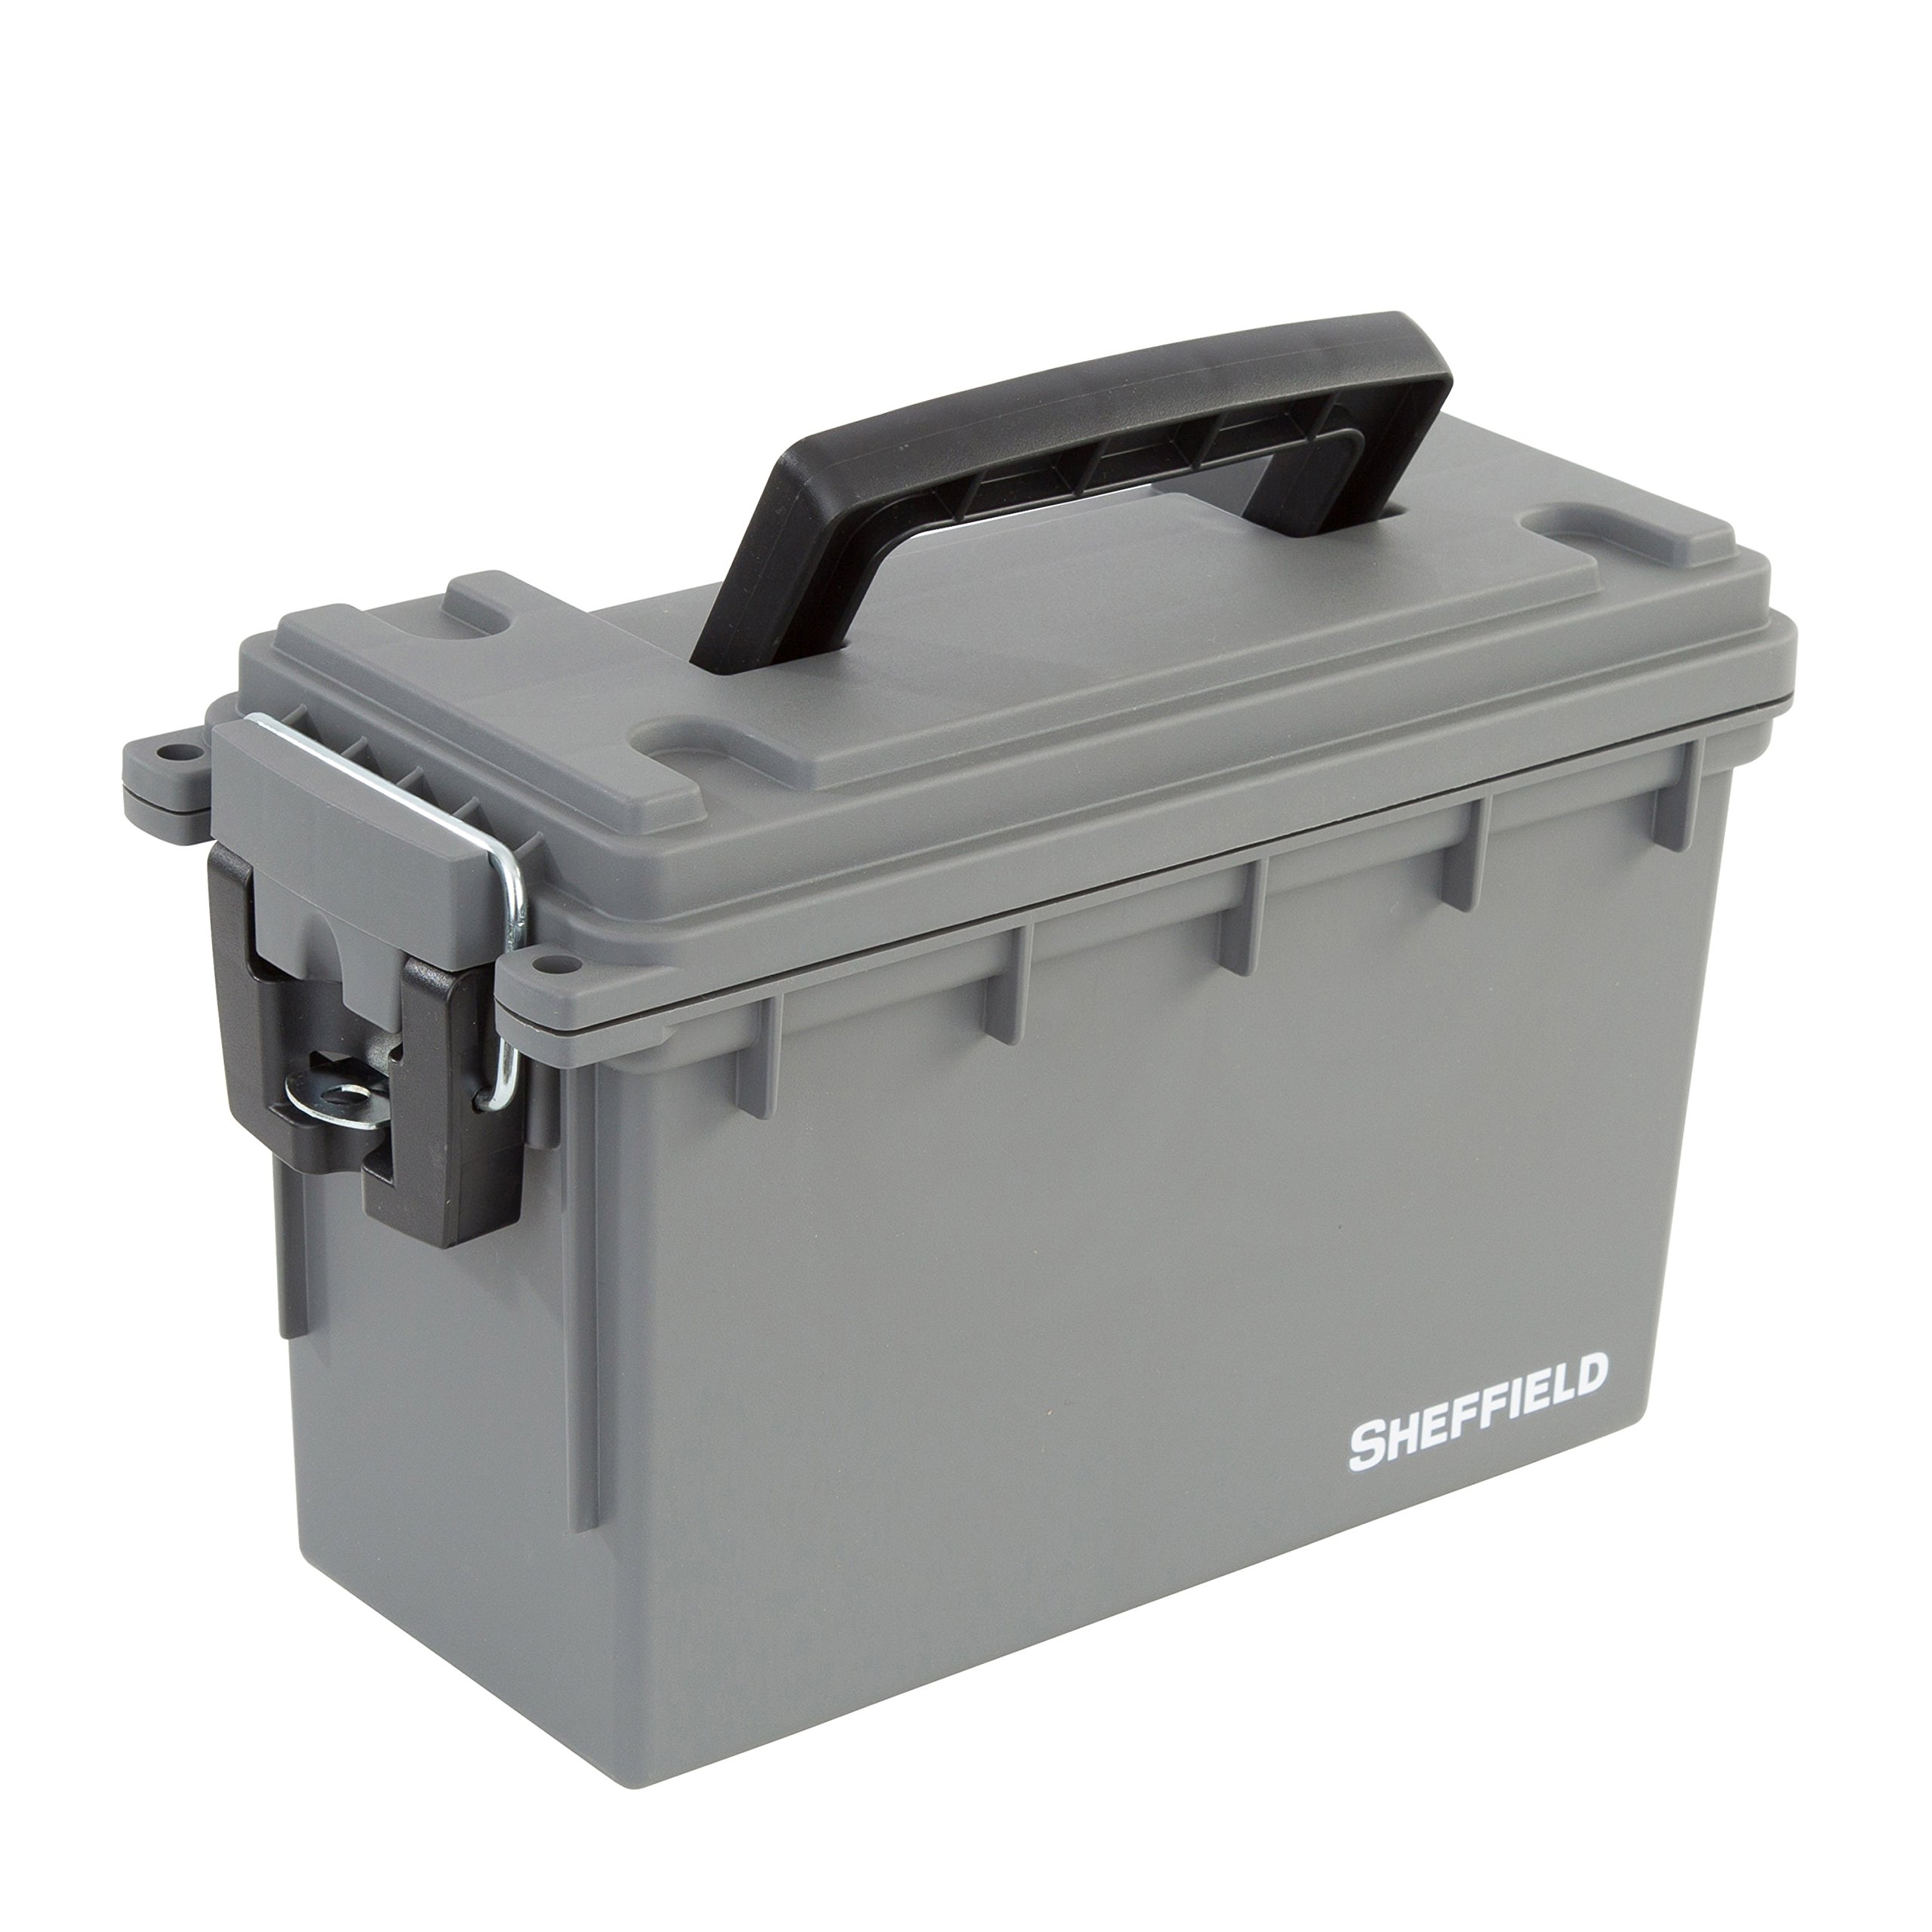 Sheffield 12628 Field Box- Gray